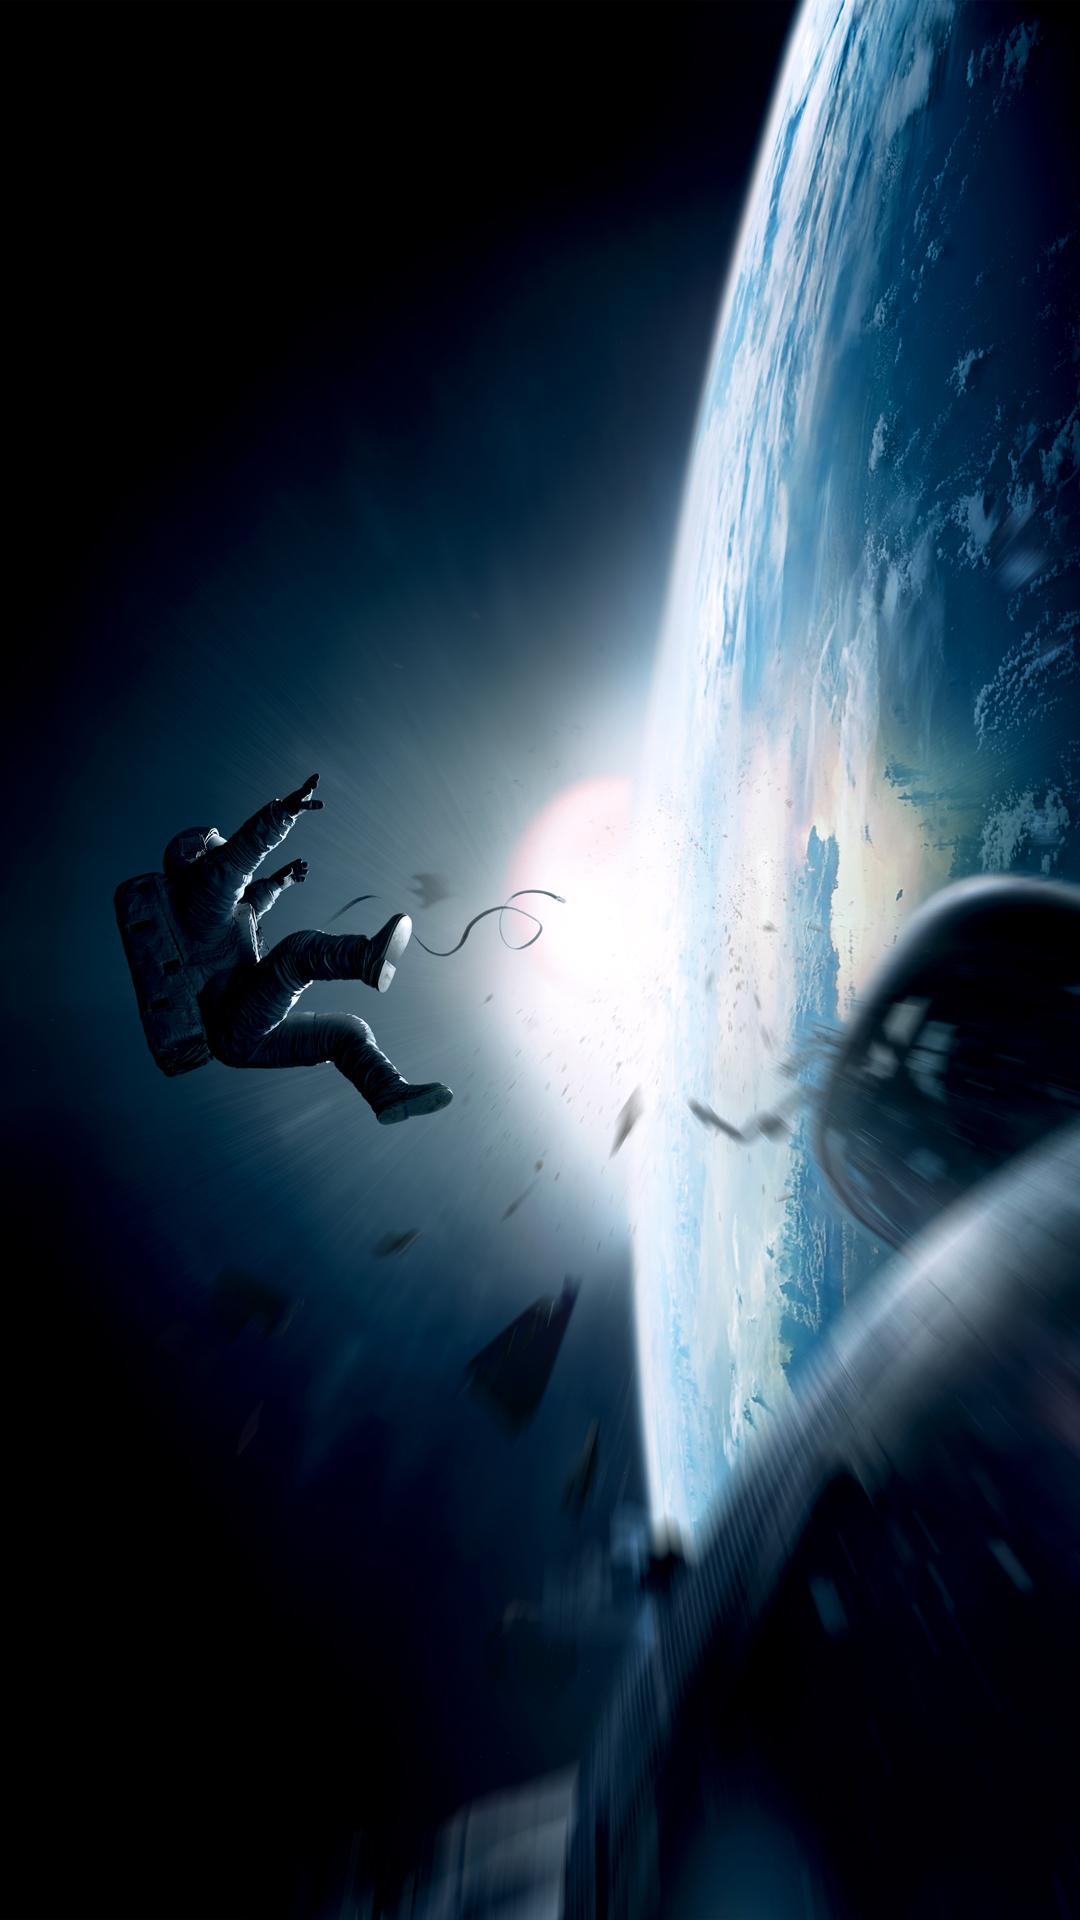 Gravity htc one wallpaper